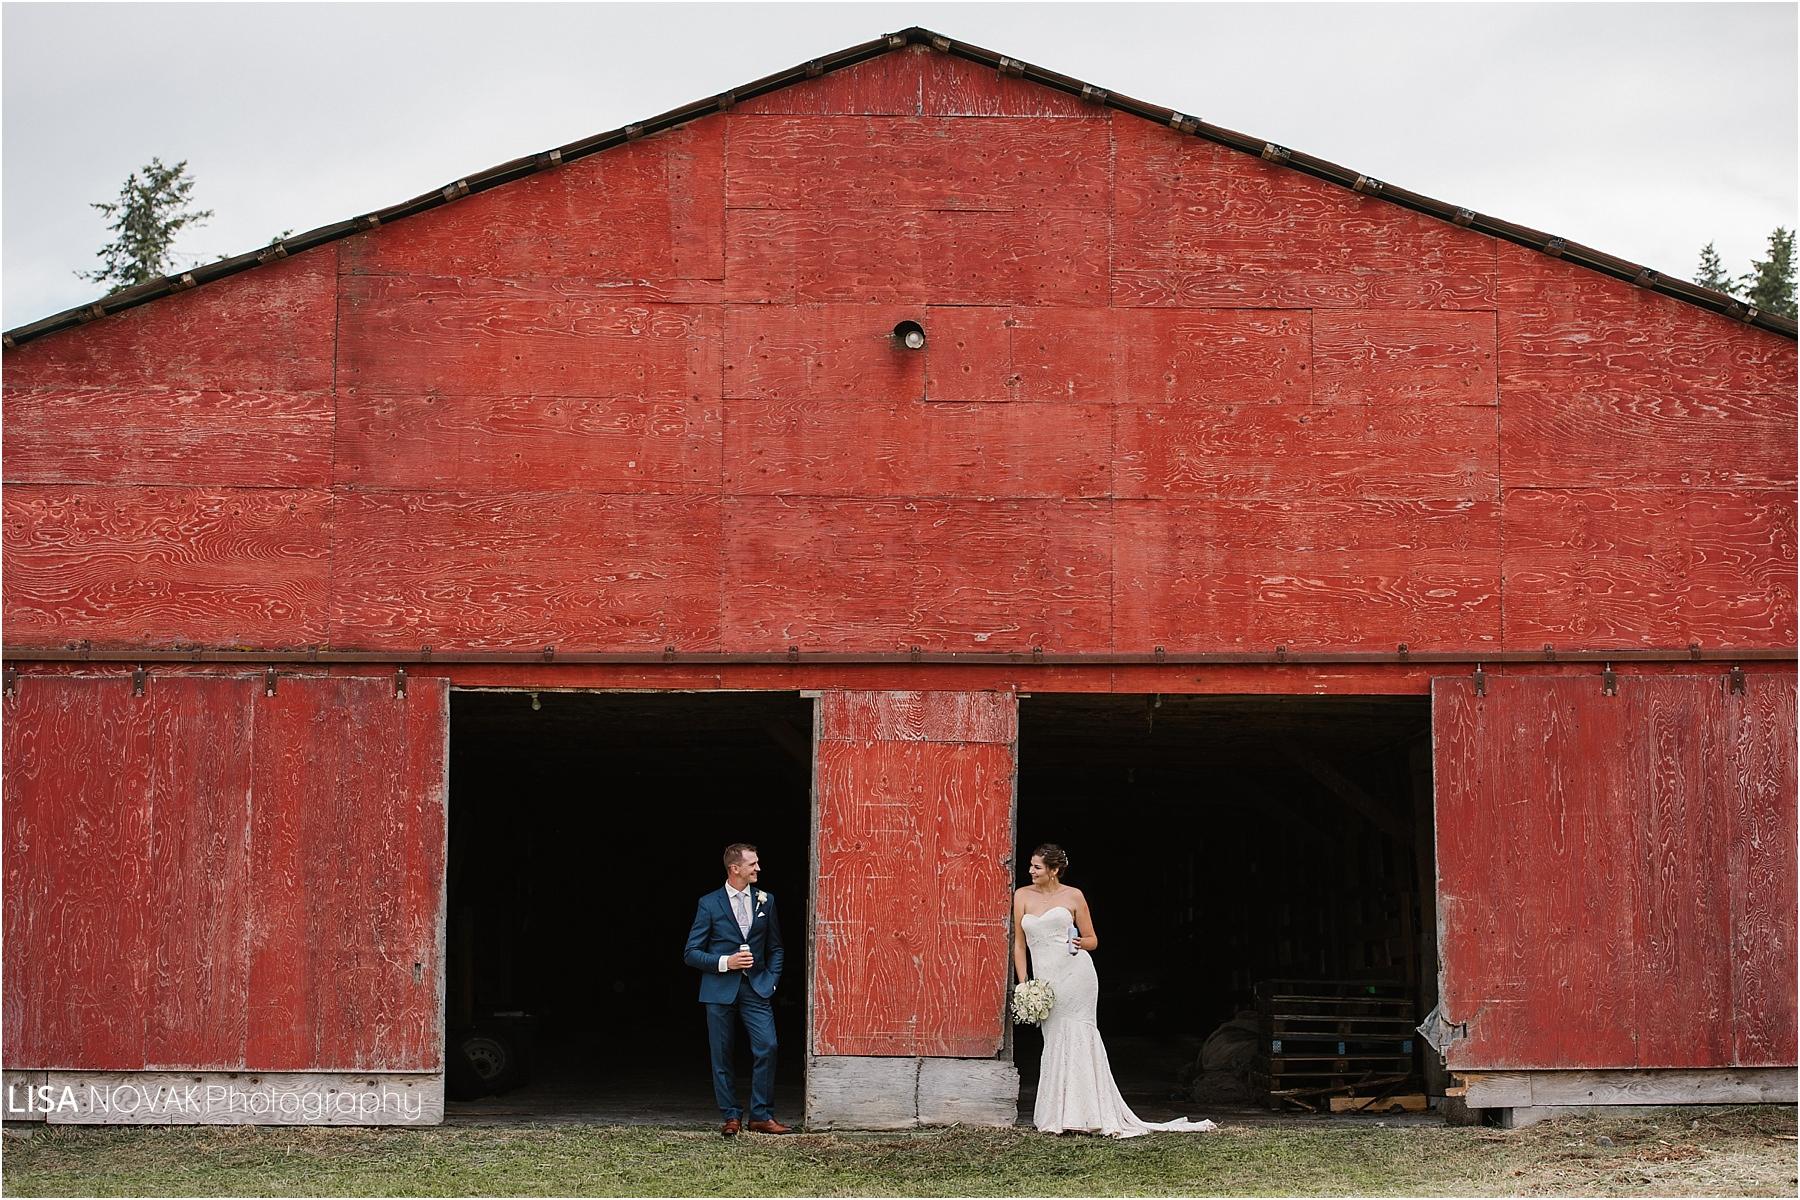 Okanagan wedding photographer BC Interior bride groom romantic epic mountain bridal portraits red barn drinks blue tux